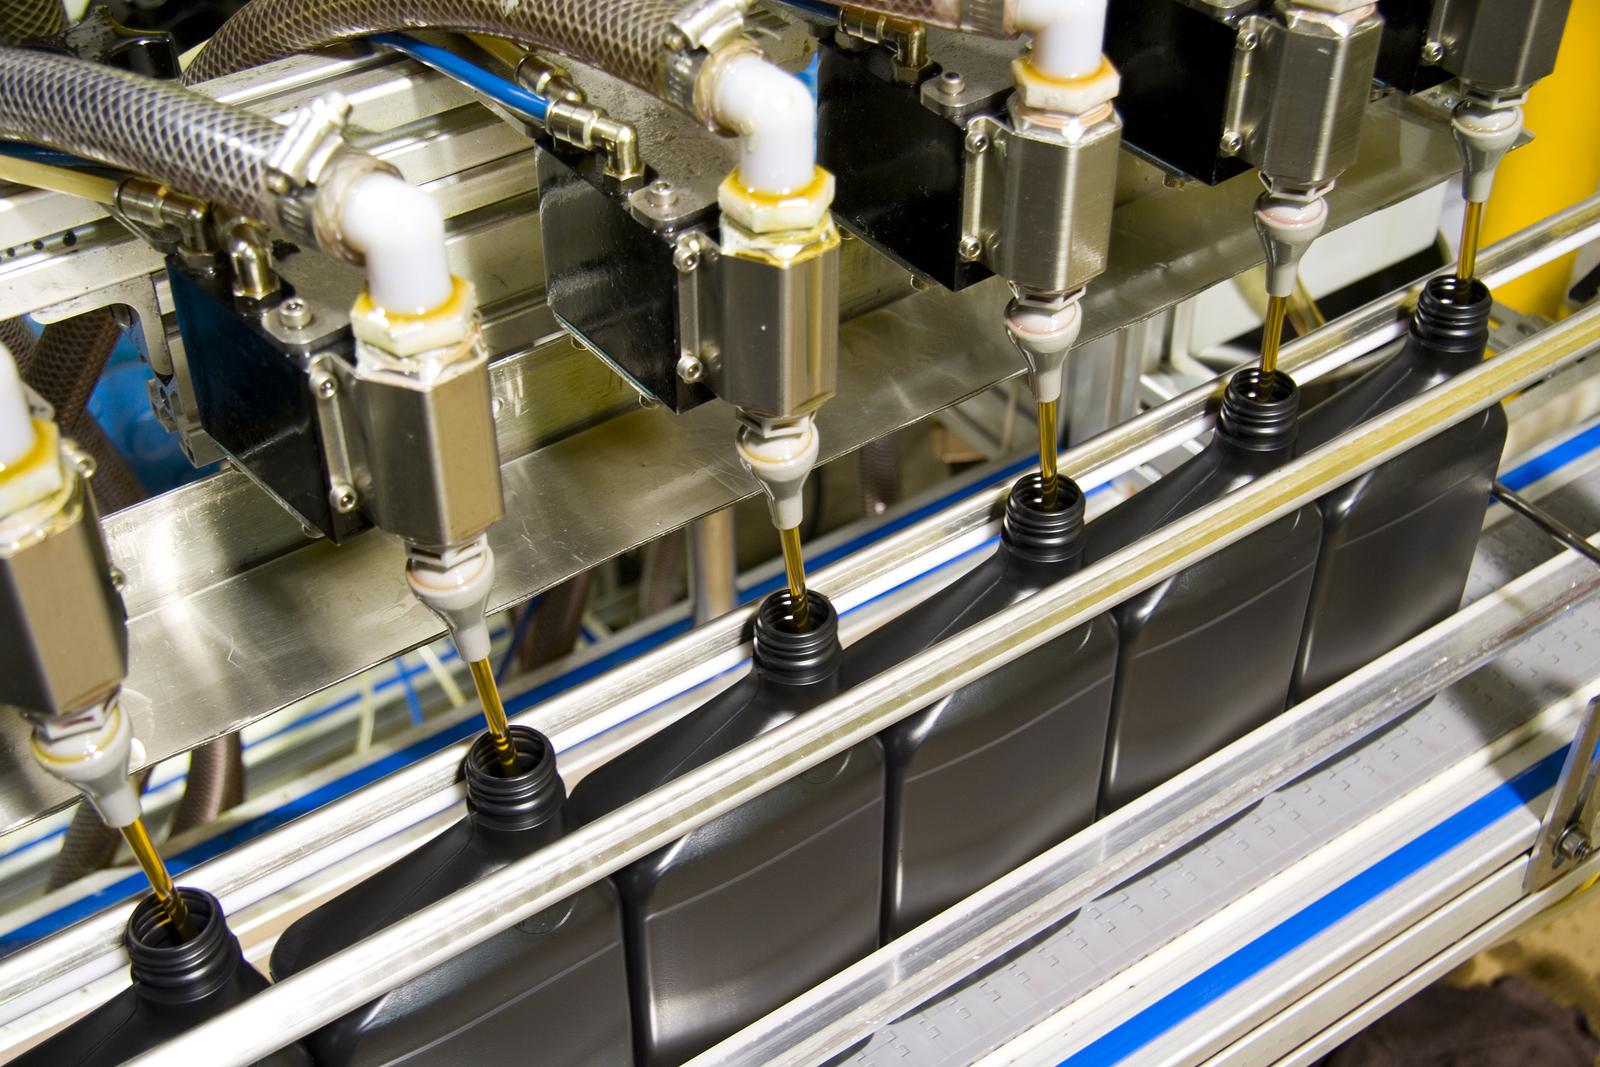 bigstock-Bottling-Process-1624135.jpg